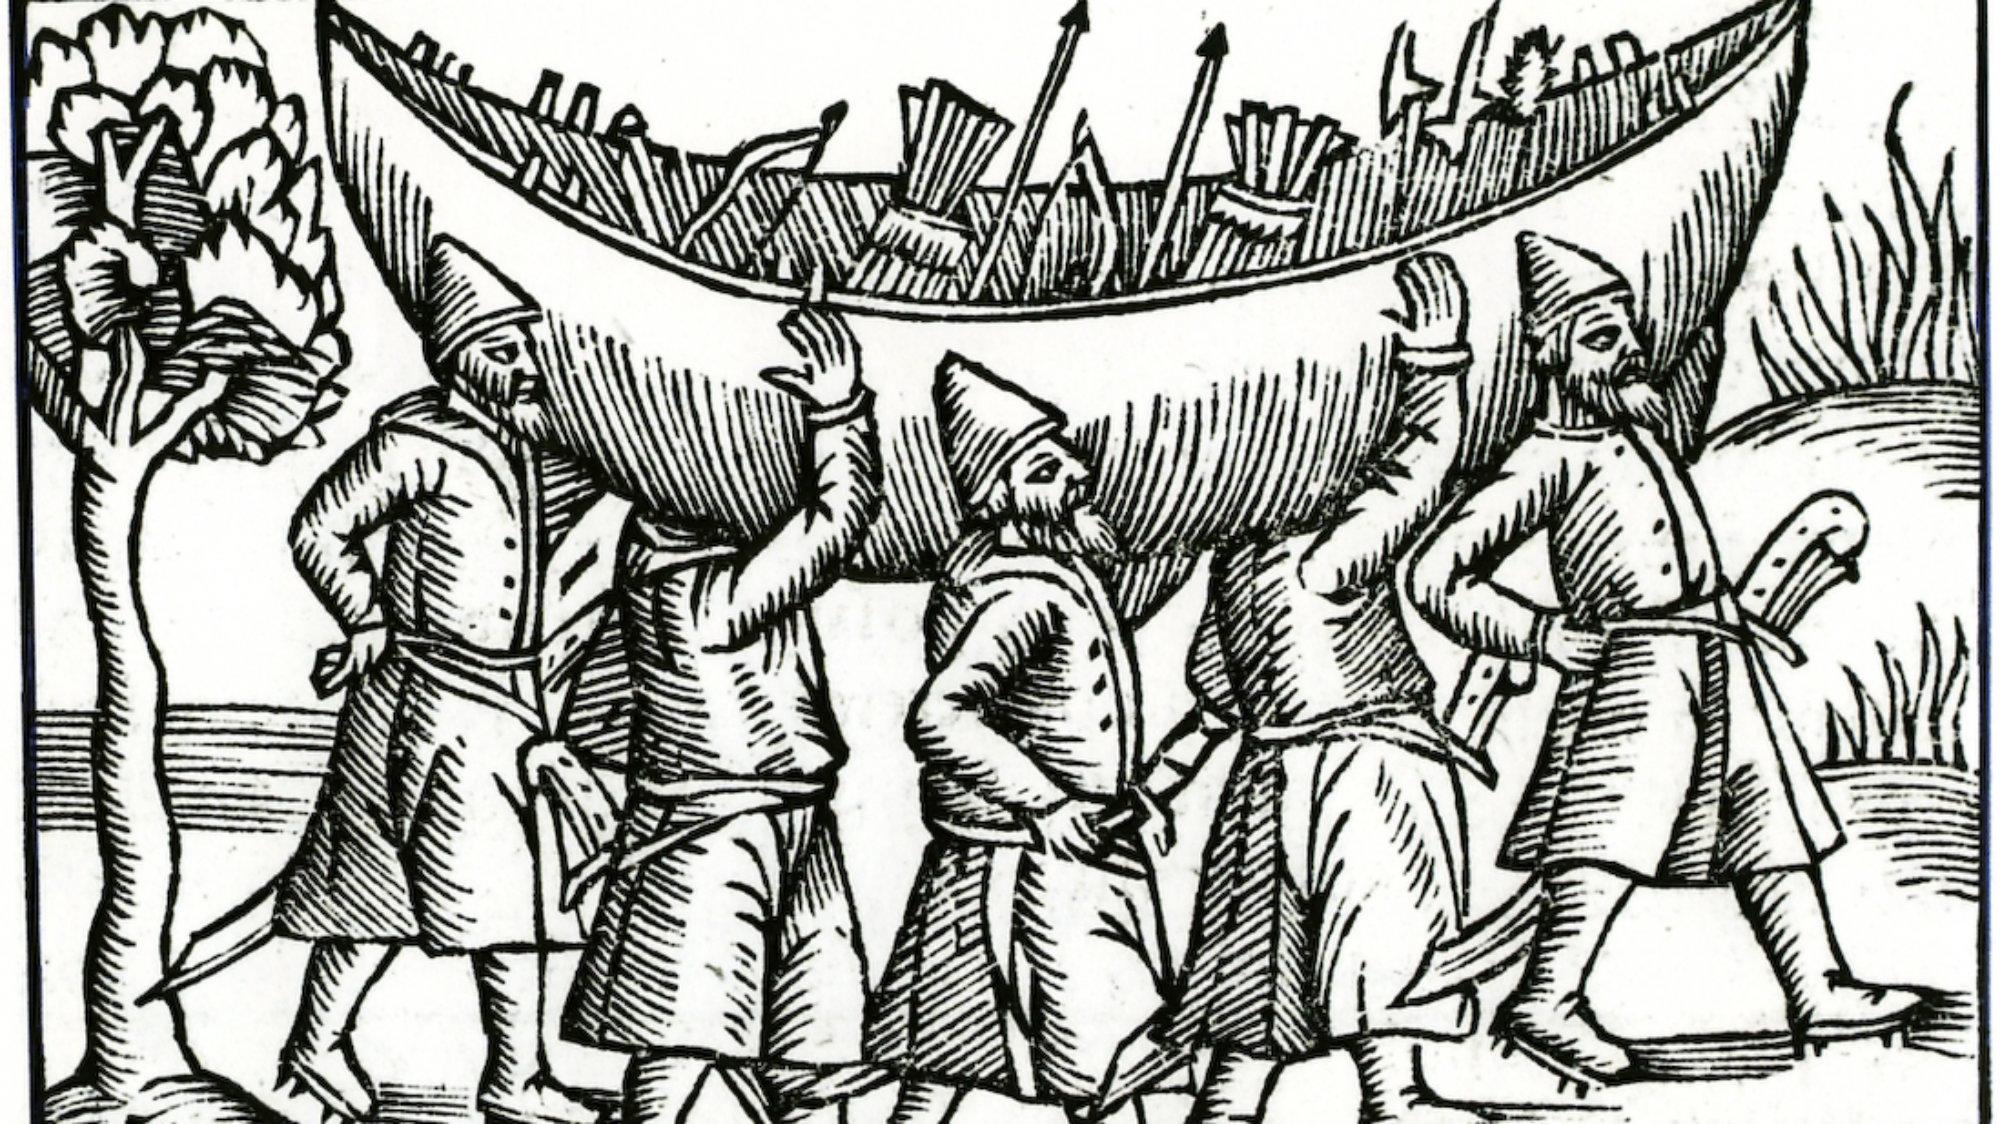 1554 engraving of Vikings transporting a boat.